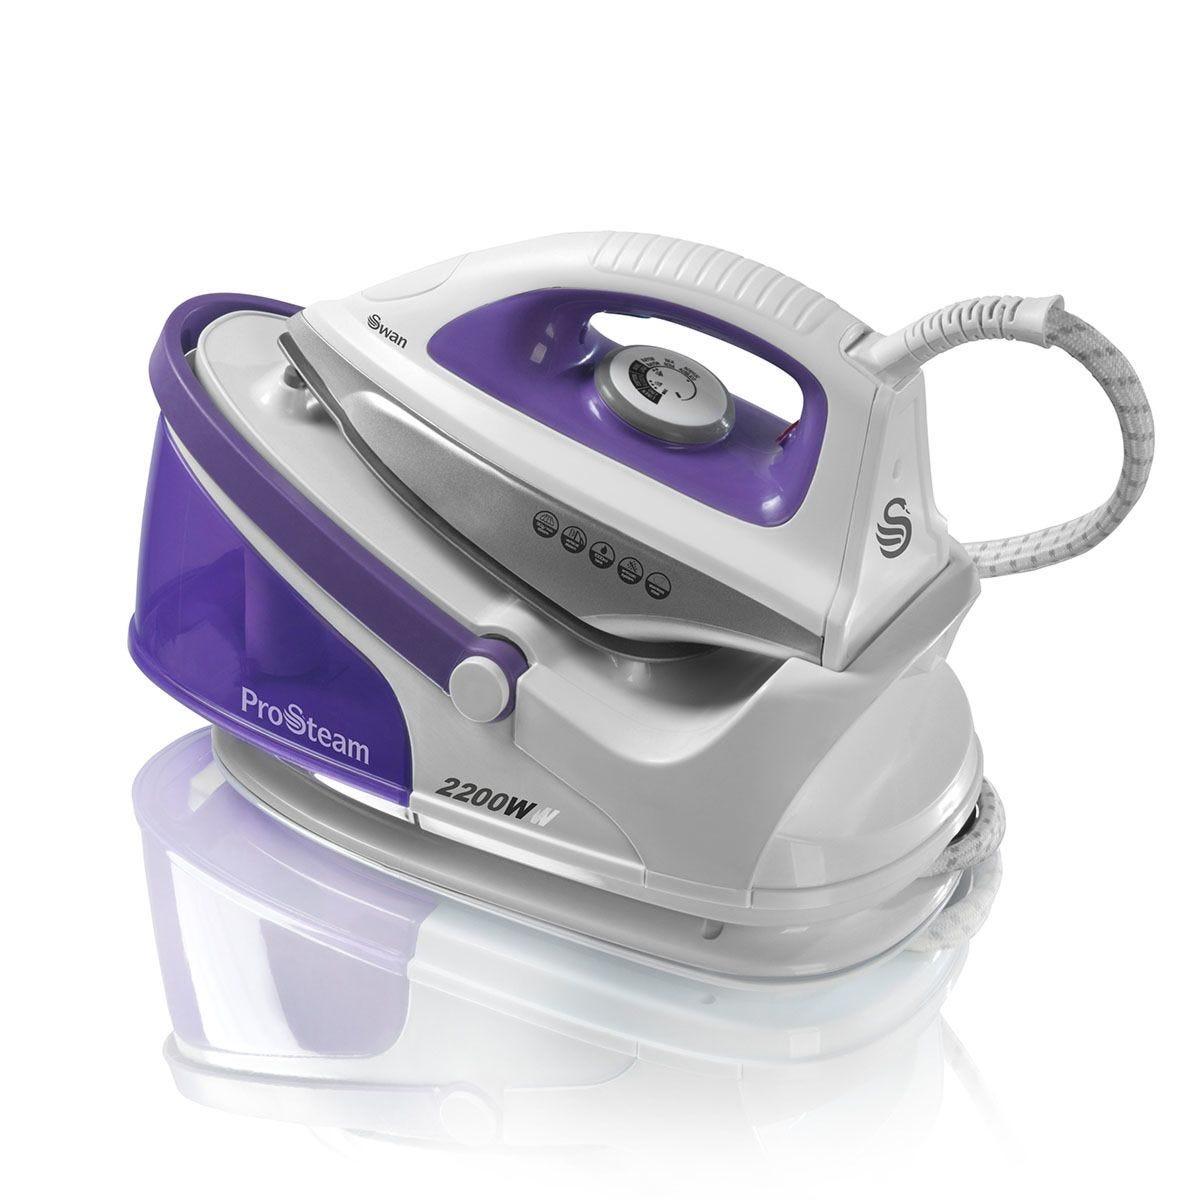 Swan SI11010N Steam Generator Iron - Purple